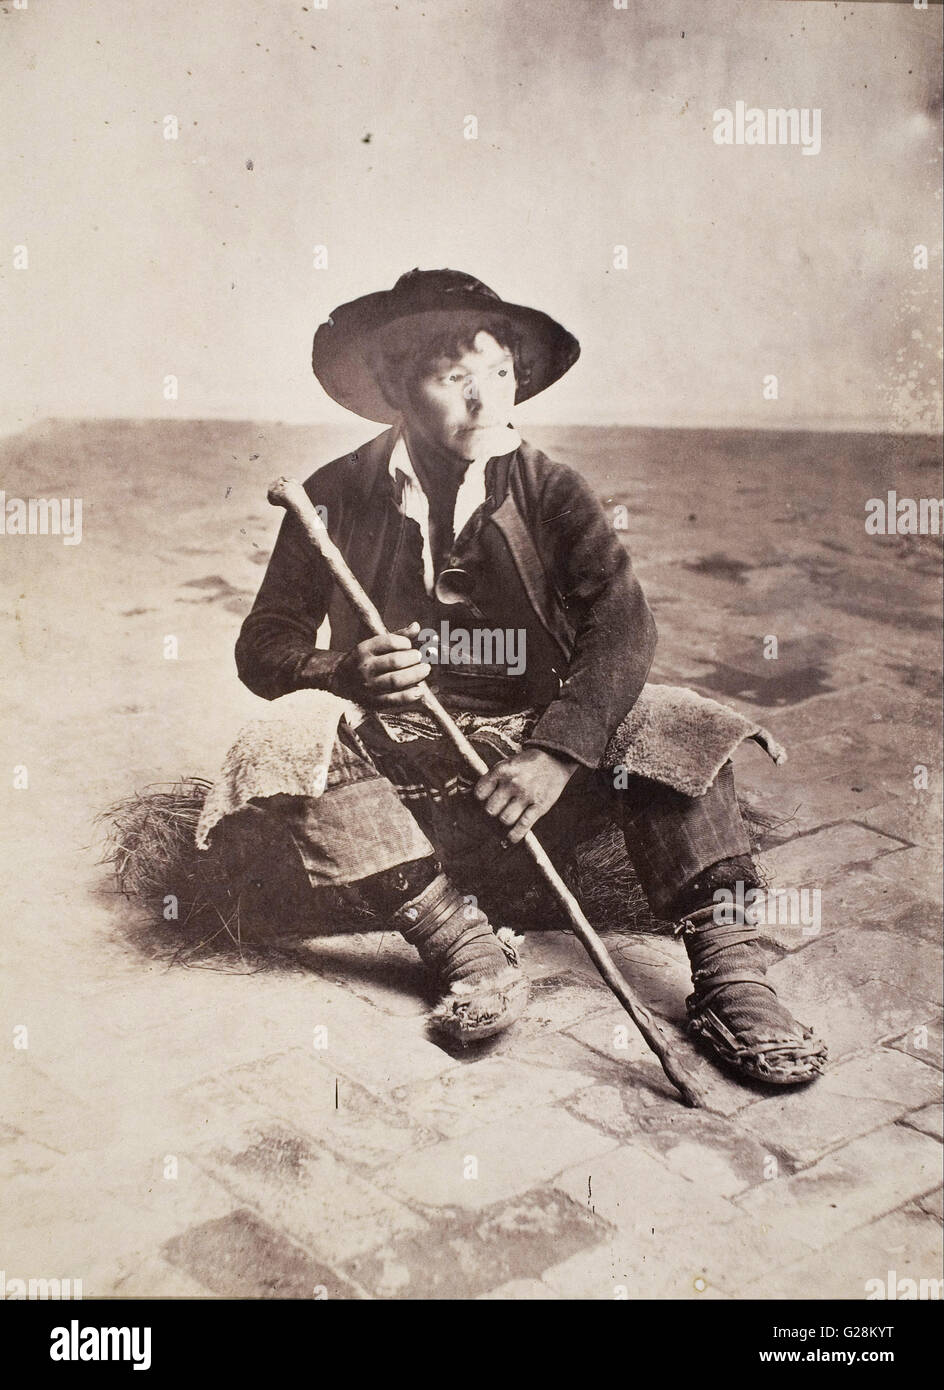 Robert Peters Napper - Seville, Andalusian shepherd boy  - MNAC - Barcelona - Stock Image